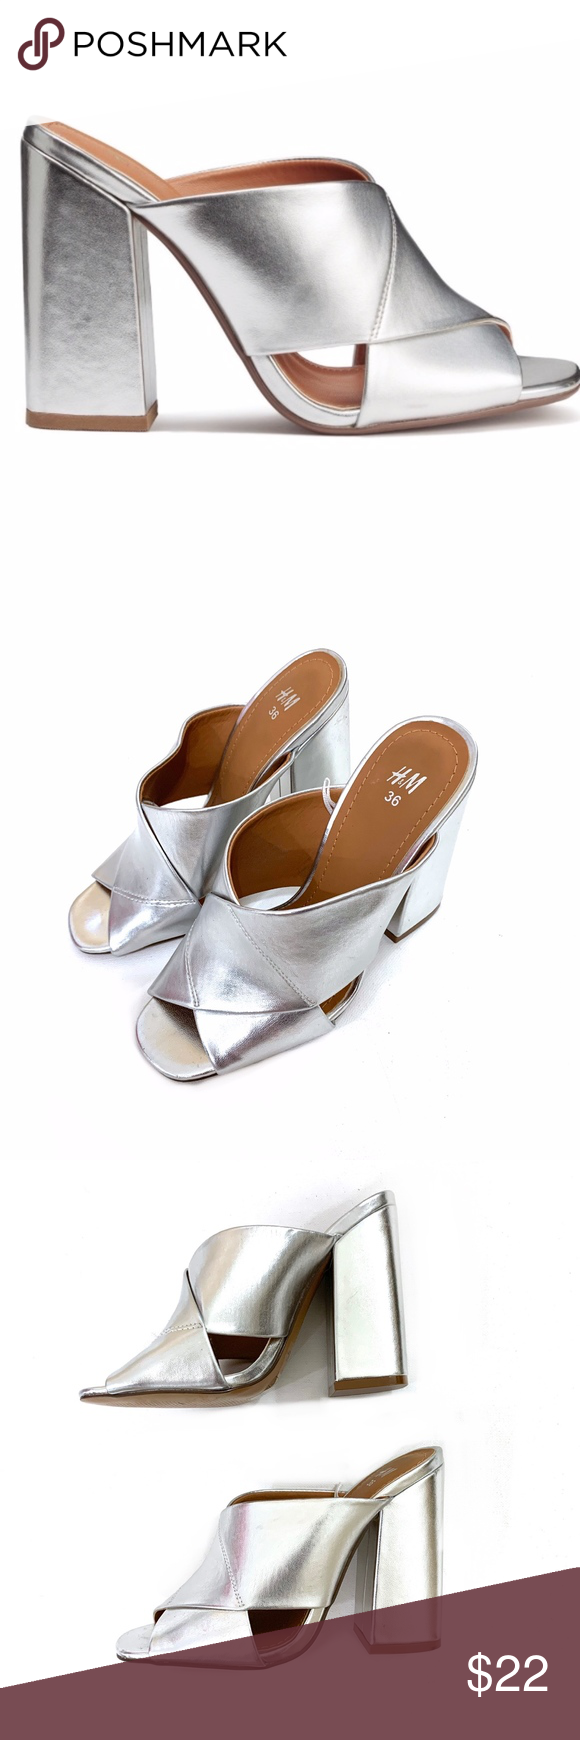 Silver Mules Heels Silver Heels H M Shoes